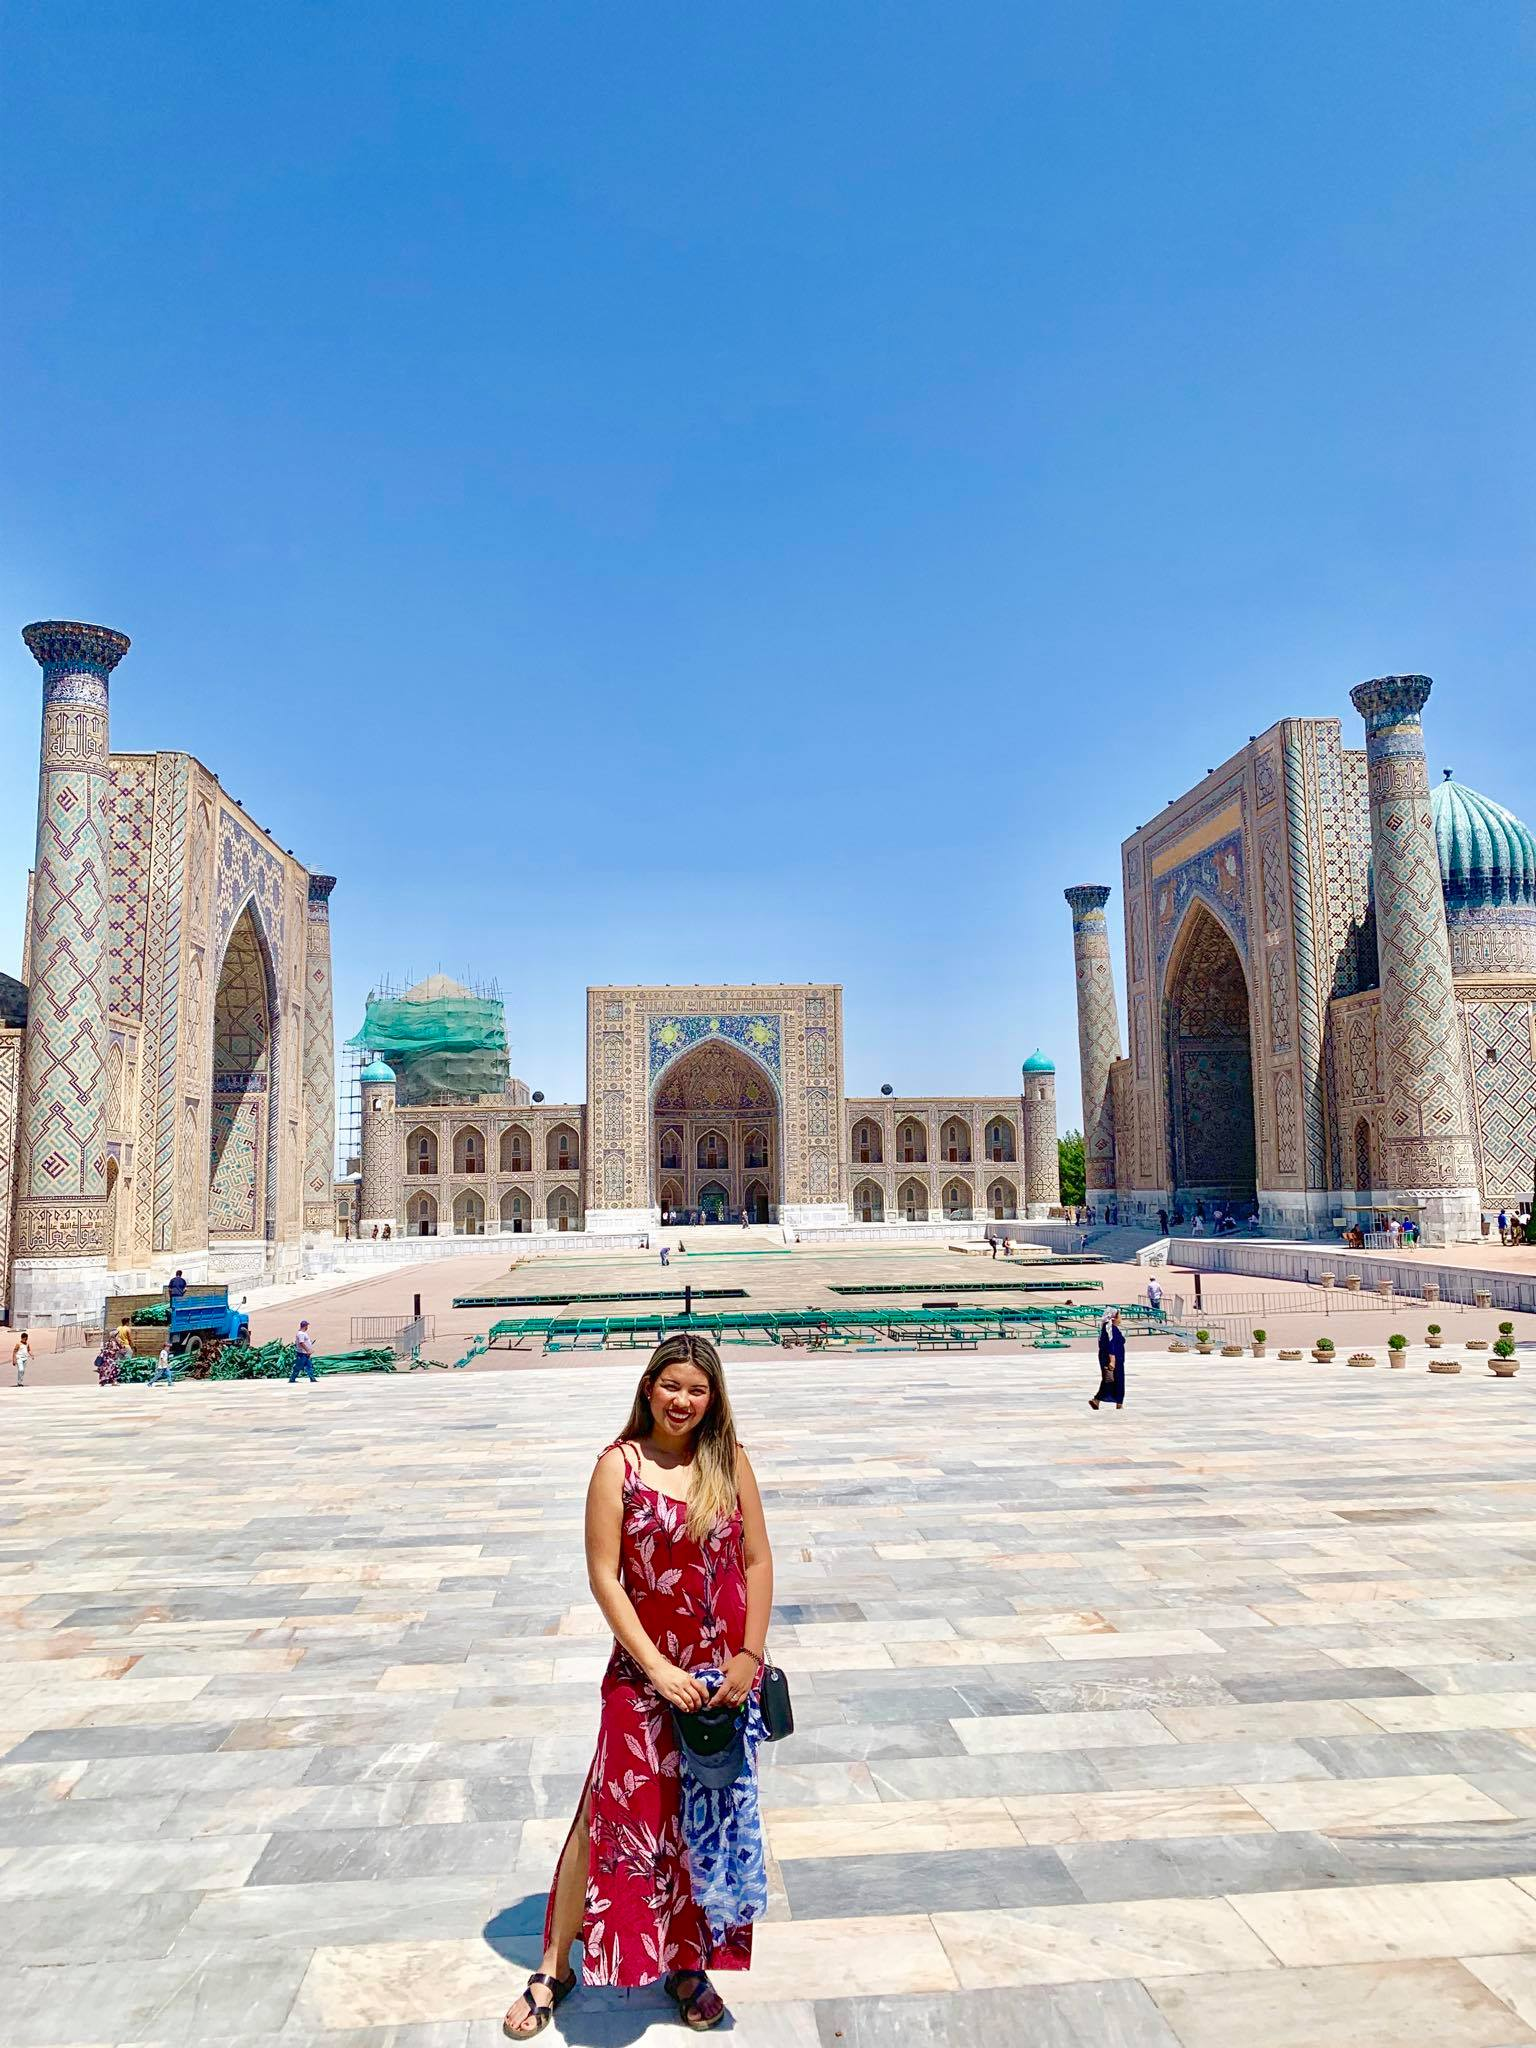 Kach Solo Travels in 2019 Siyab Bazaar and Registan on my first day in Samarkand4.jpg